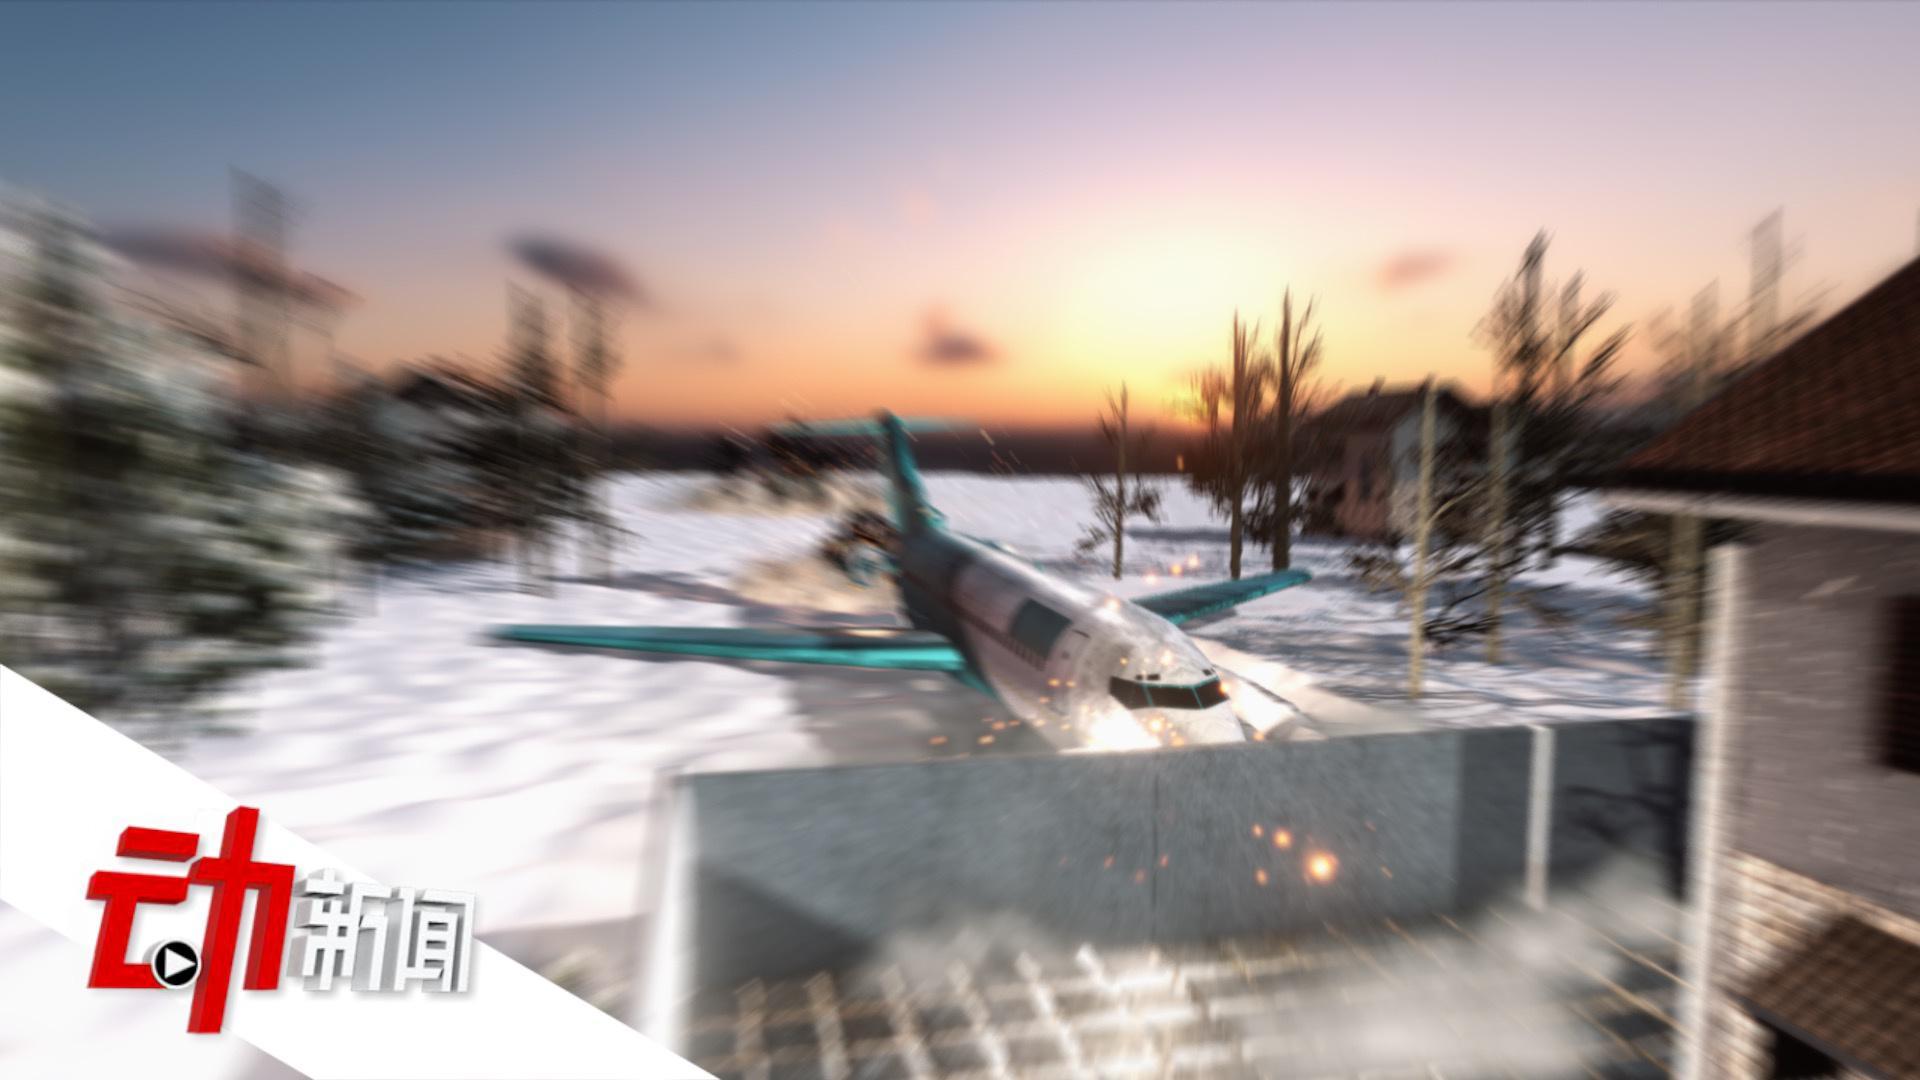 3D还原哈98人客机坠毁瞬间:19秒升至670米下坠 扎进二层楼房